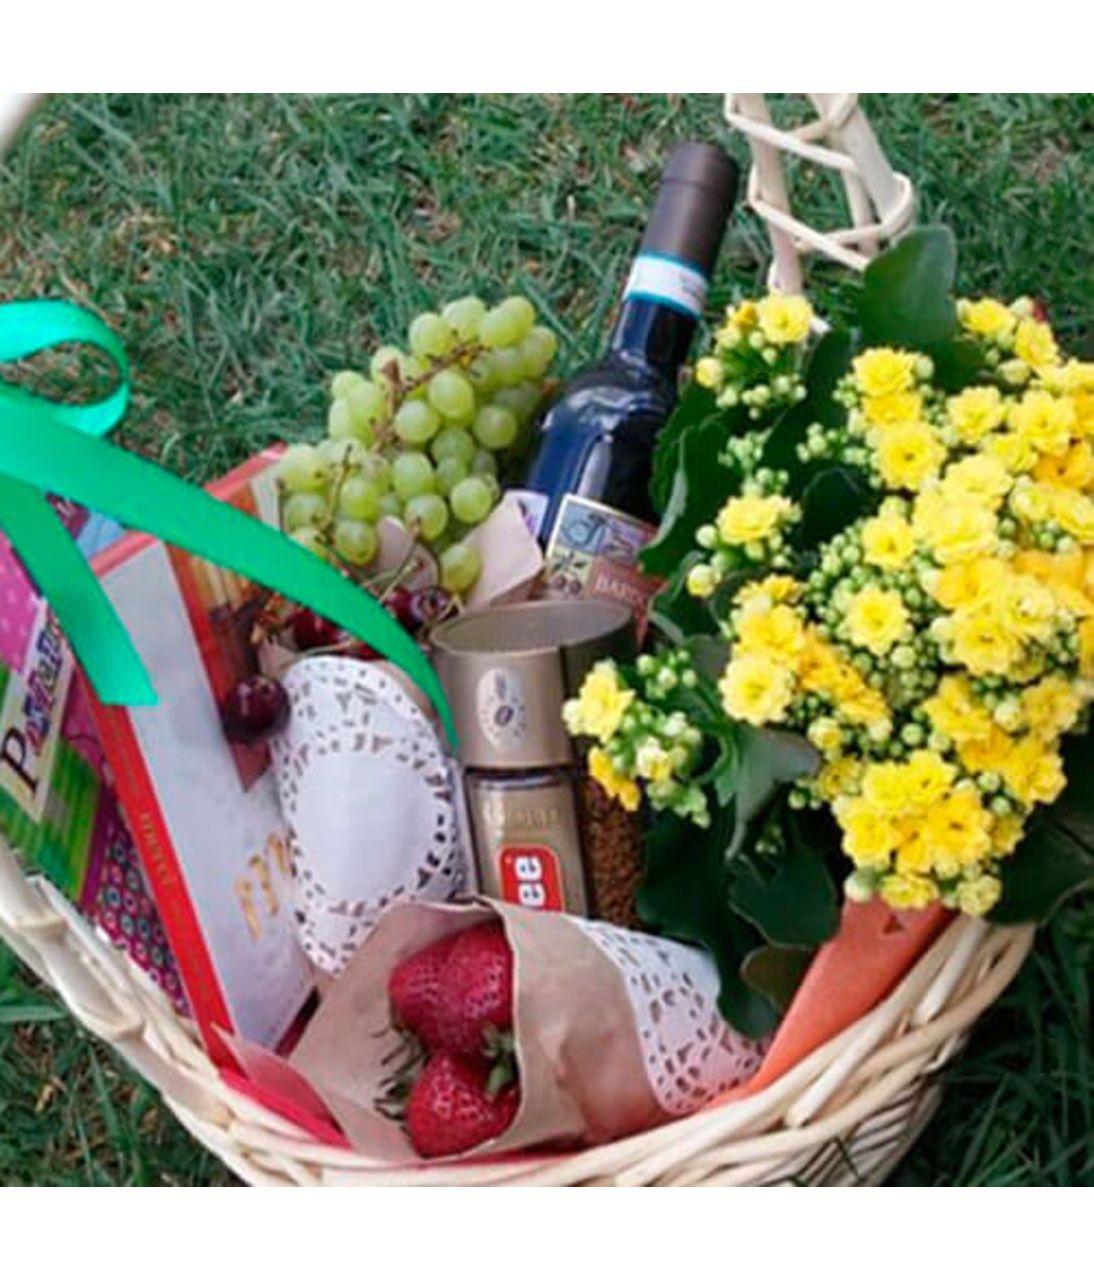 "Подарункова корзина ""Милий подарунок"". Superflowers.com.ua"